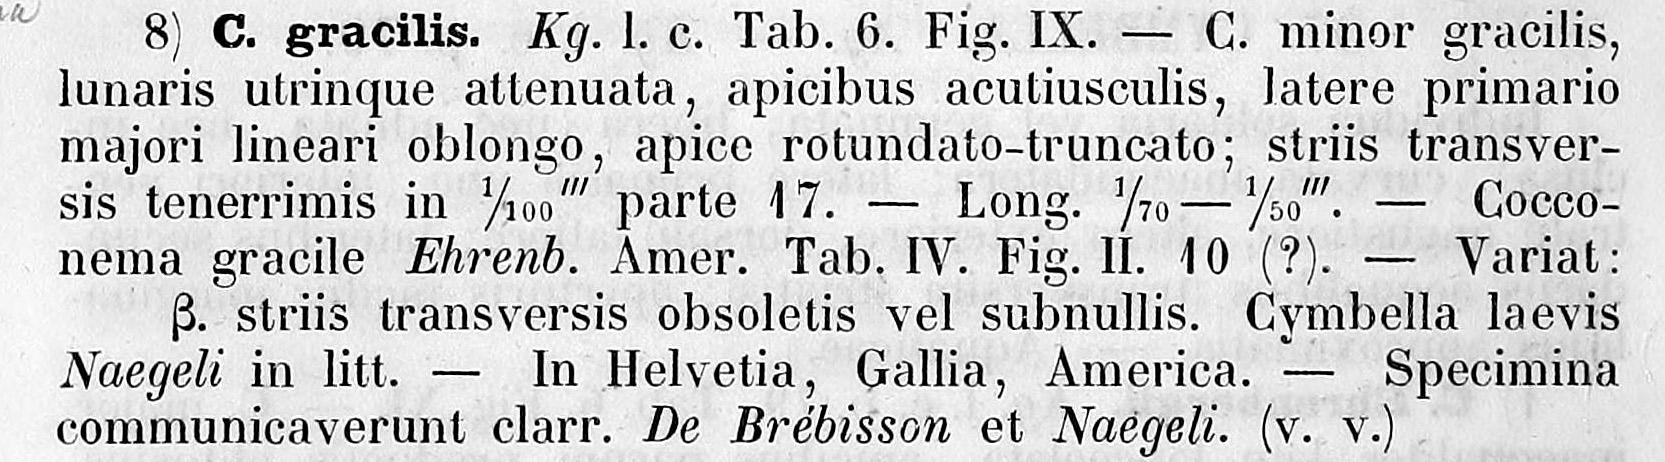 Cymbella gracilis orig descr